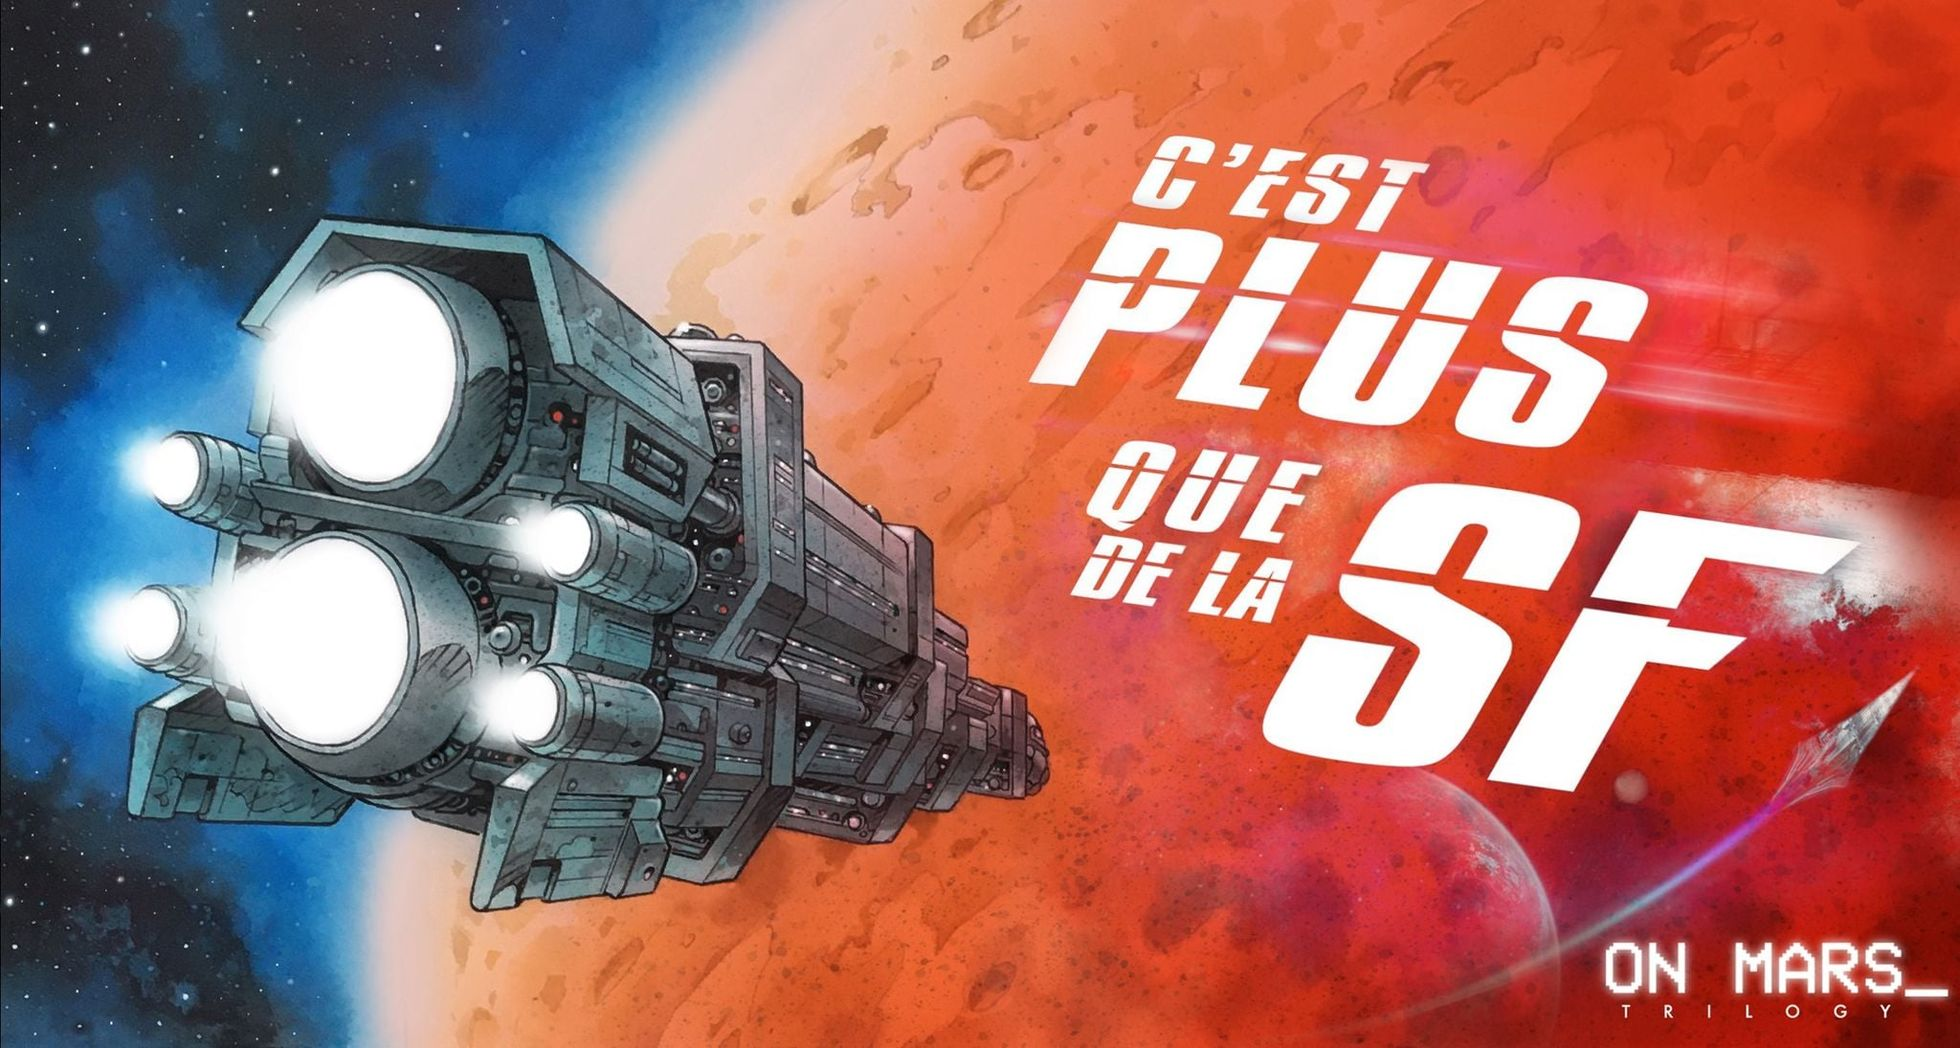 C'est plus que de la SF #55 On Mars - Sylvain Runberg / Grun